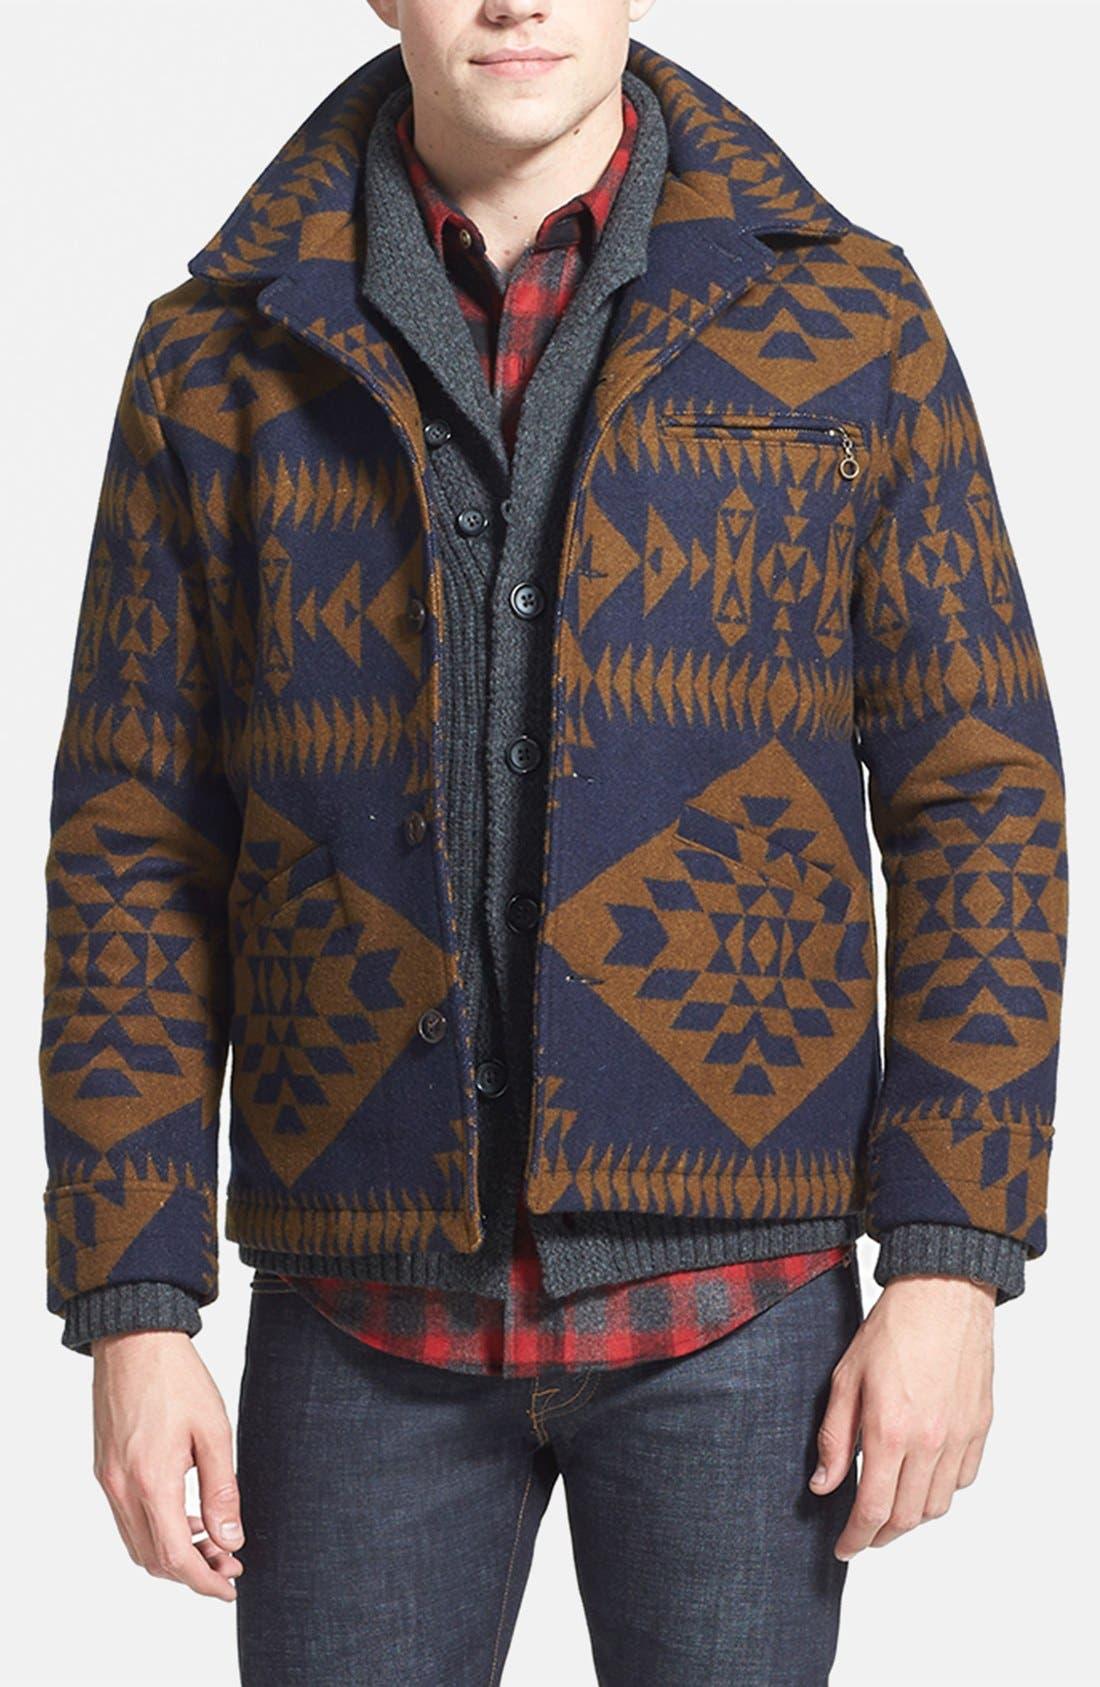 Main Image - Pendleton Jacket, 7 Diamonds Sweater, Pendleton Fitted Flannel Shirt & J Brand Skinny Fit Jeans